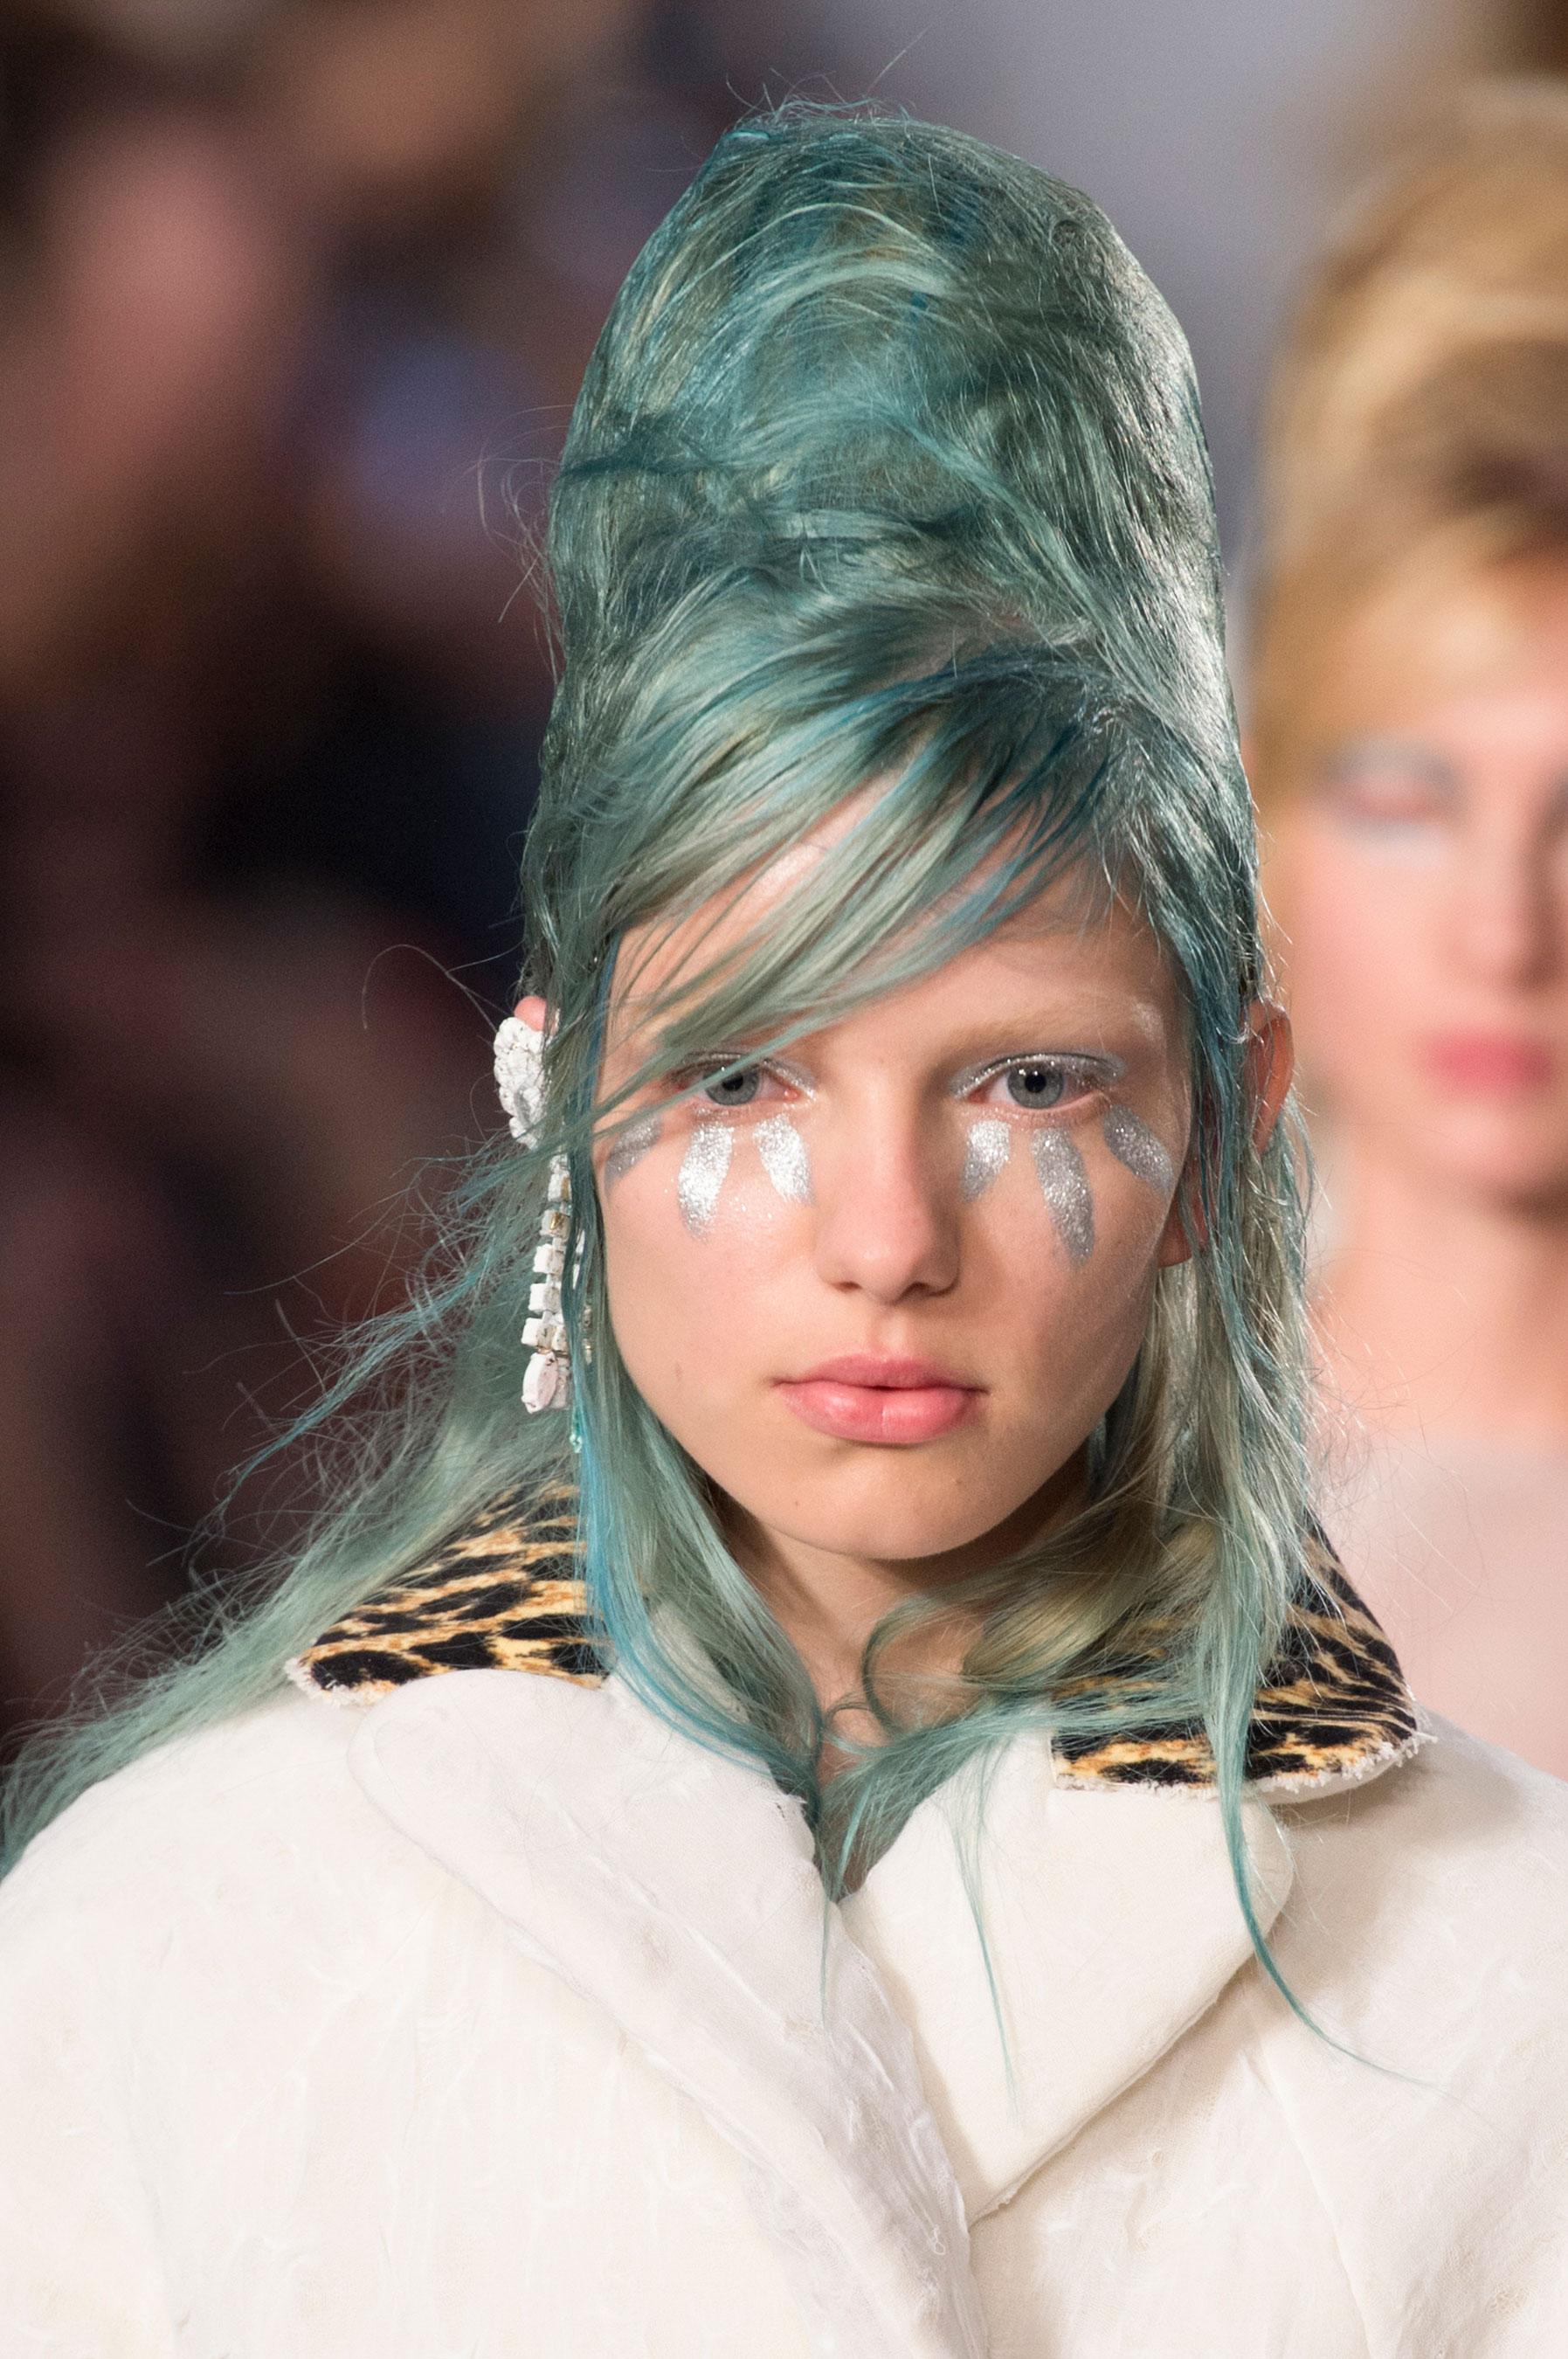 Maison-Margiela-spring-2016-runway-beauty-fashion-show-the-impression-055